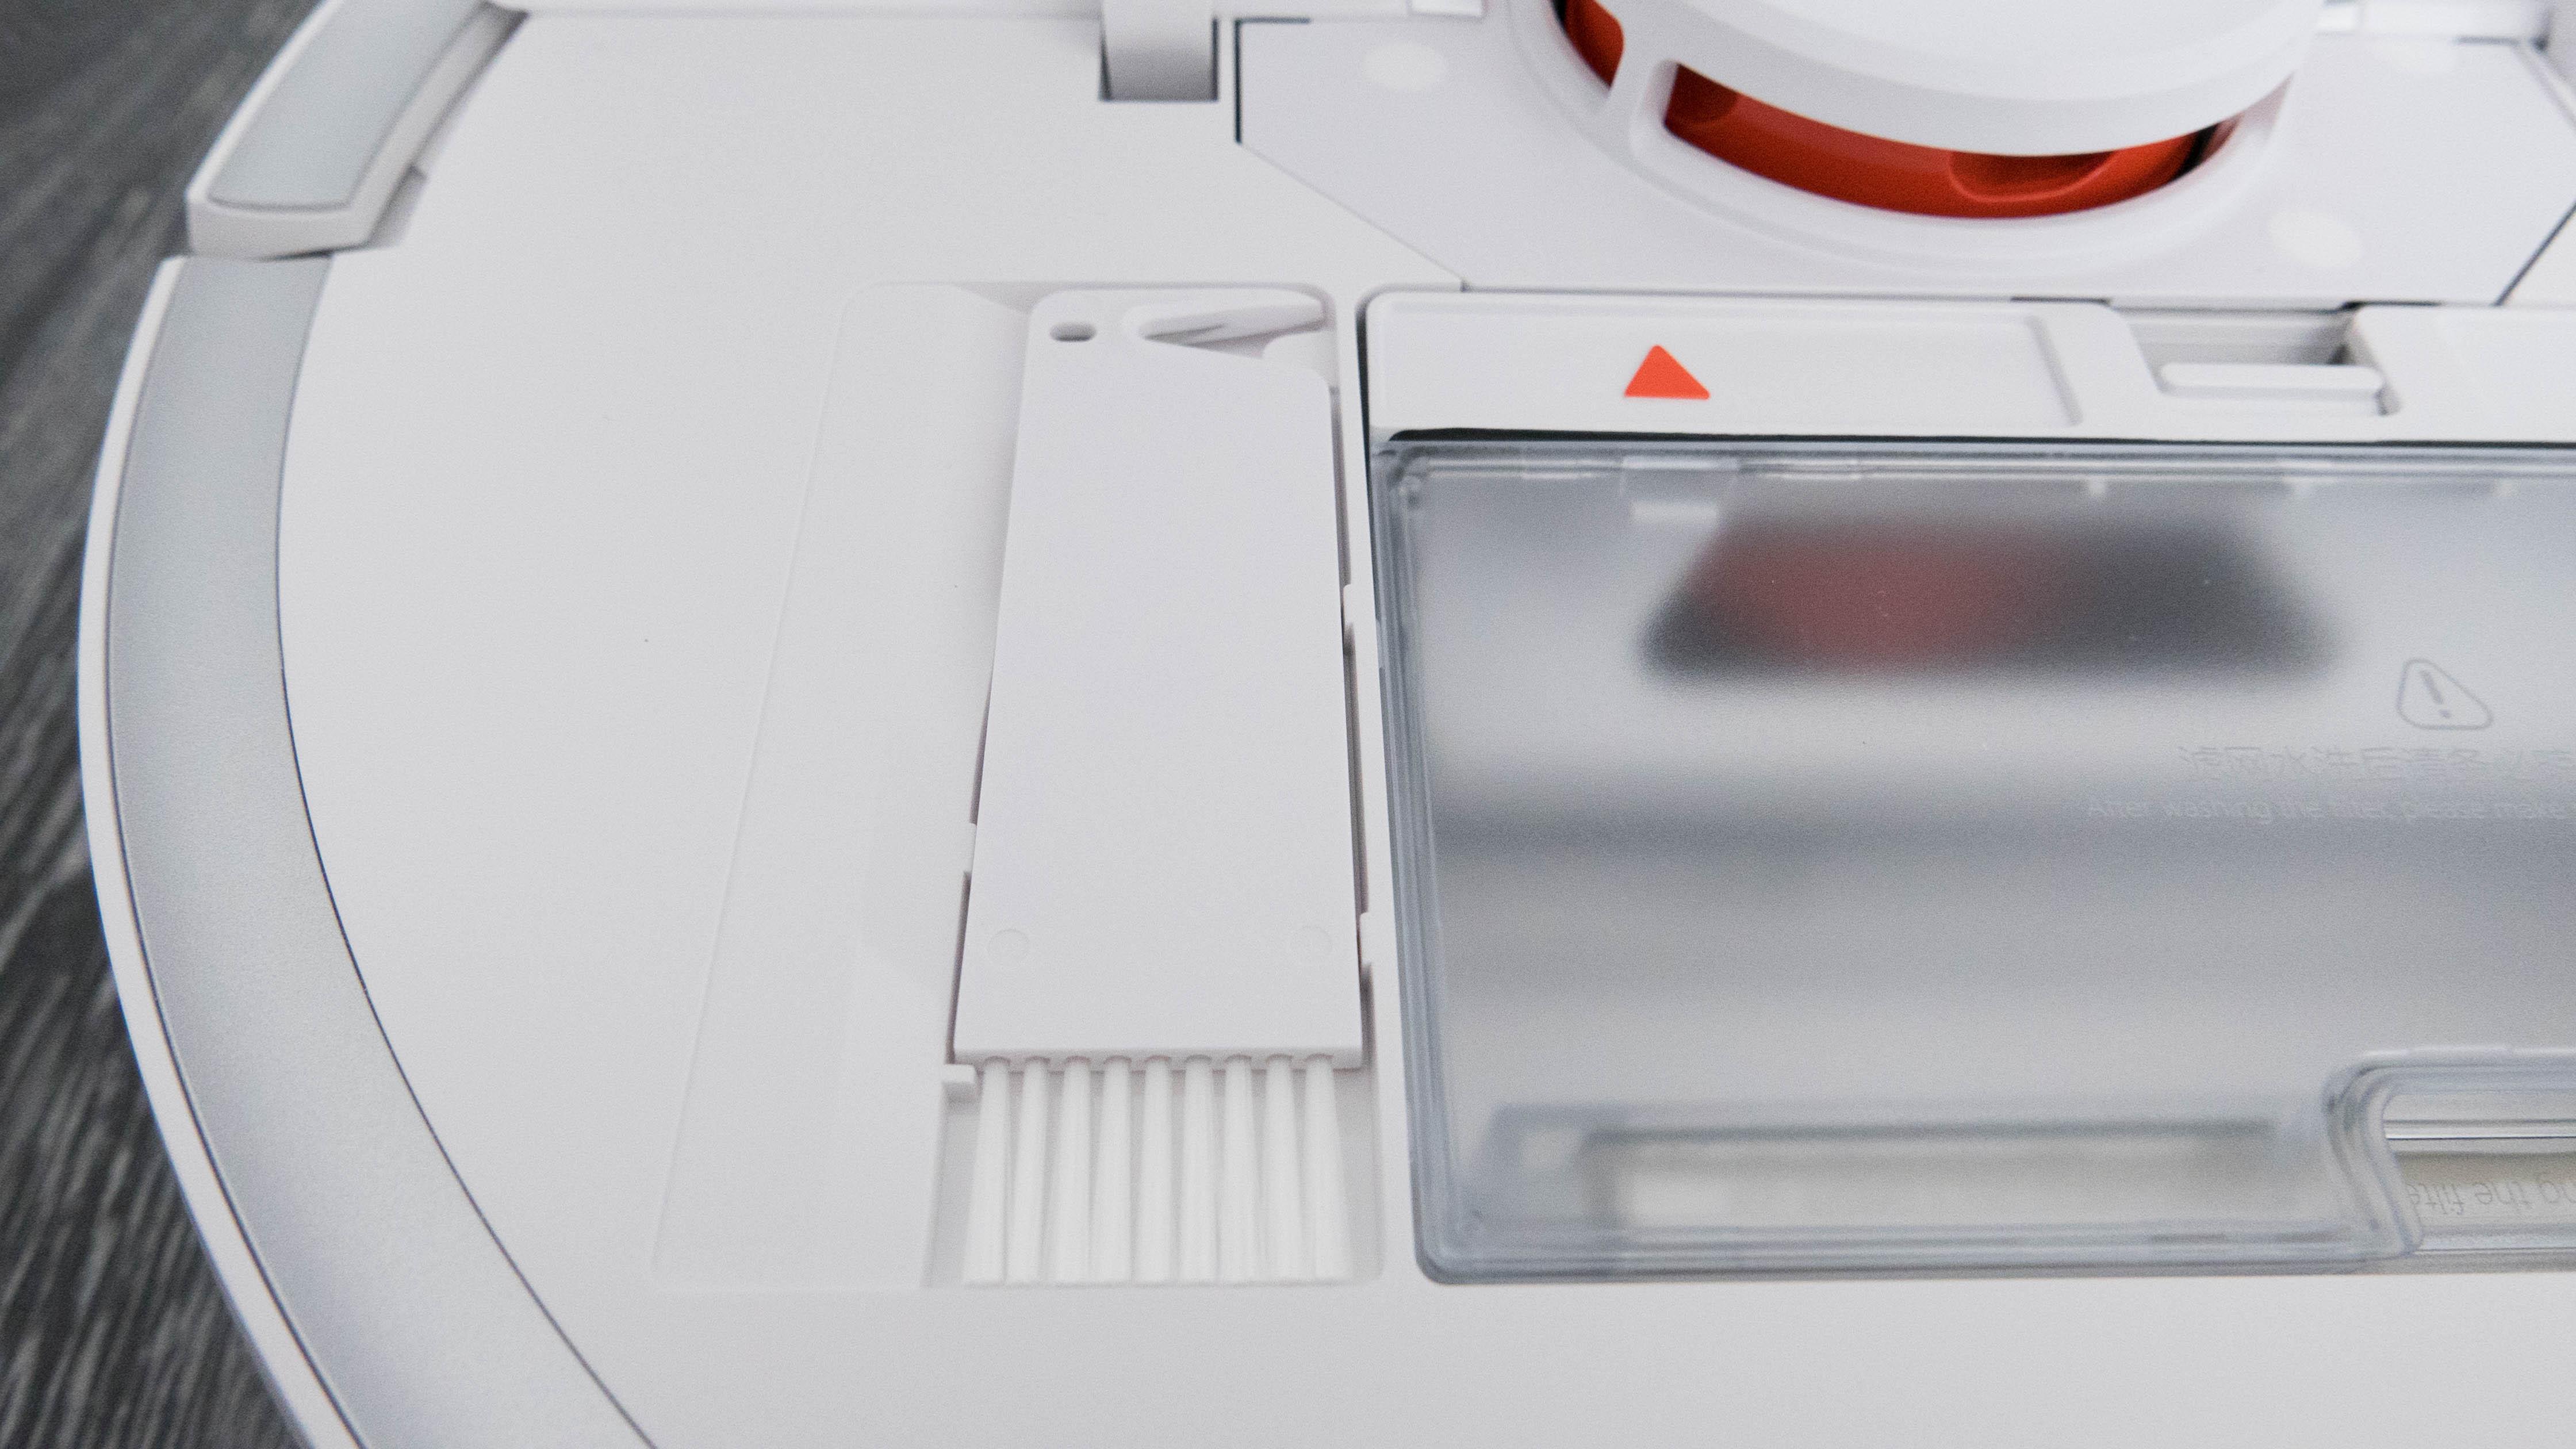 Xiaomi Mi Robot 2 Roborock S50 Roboter Details 21